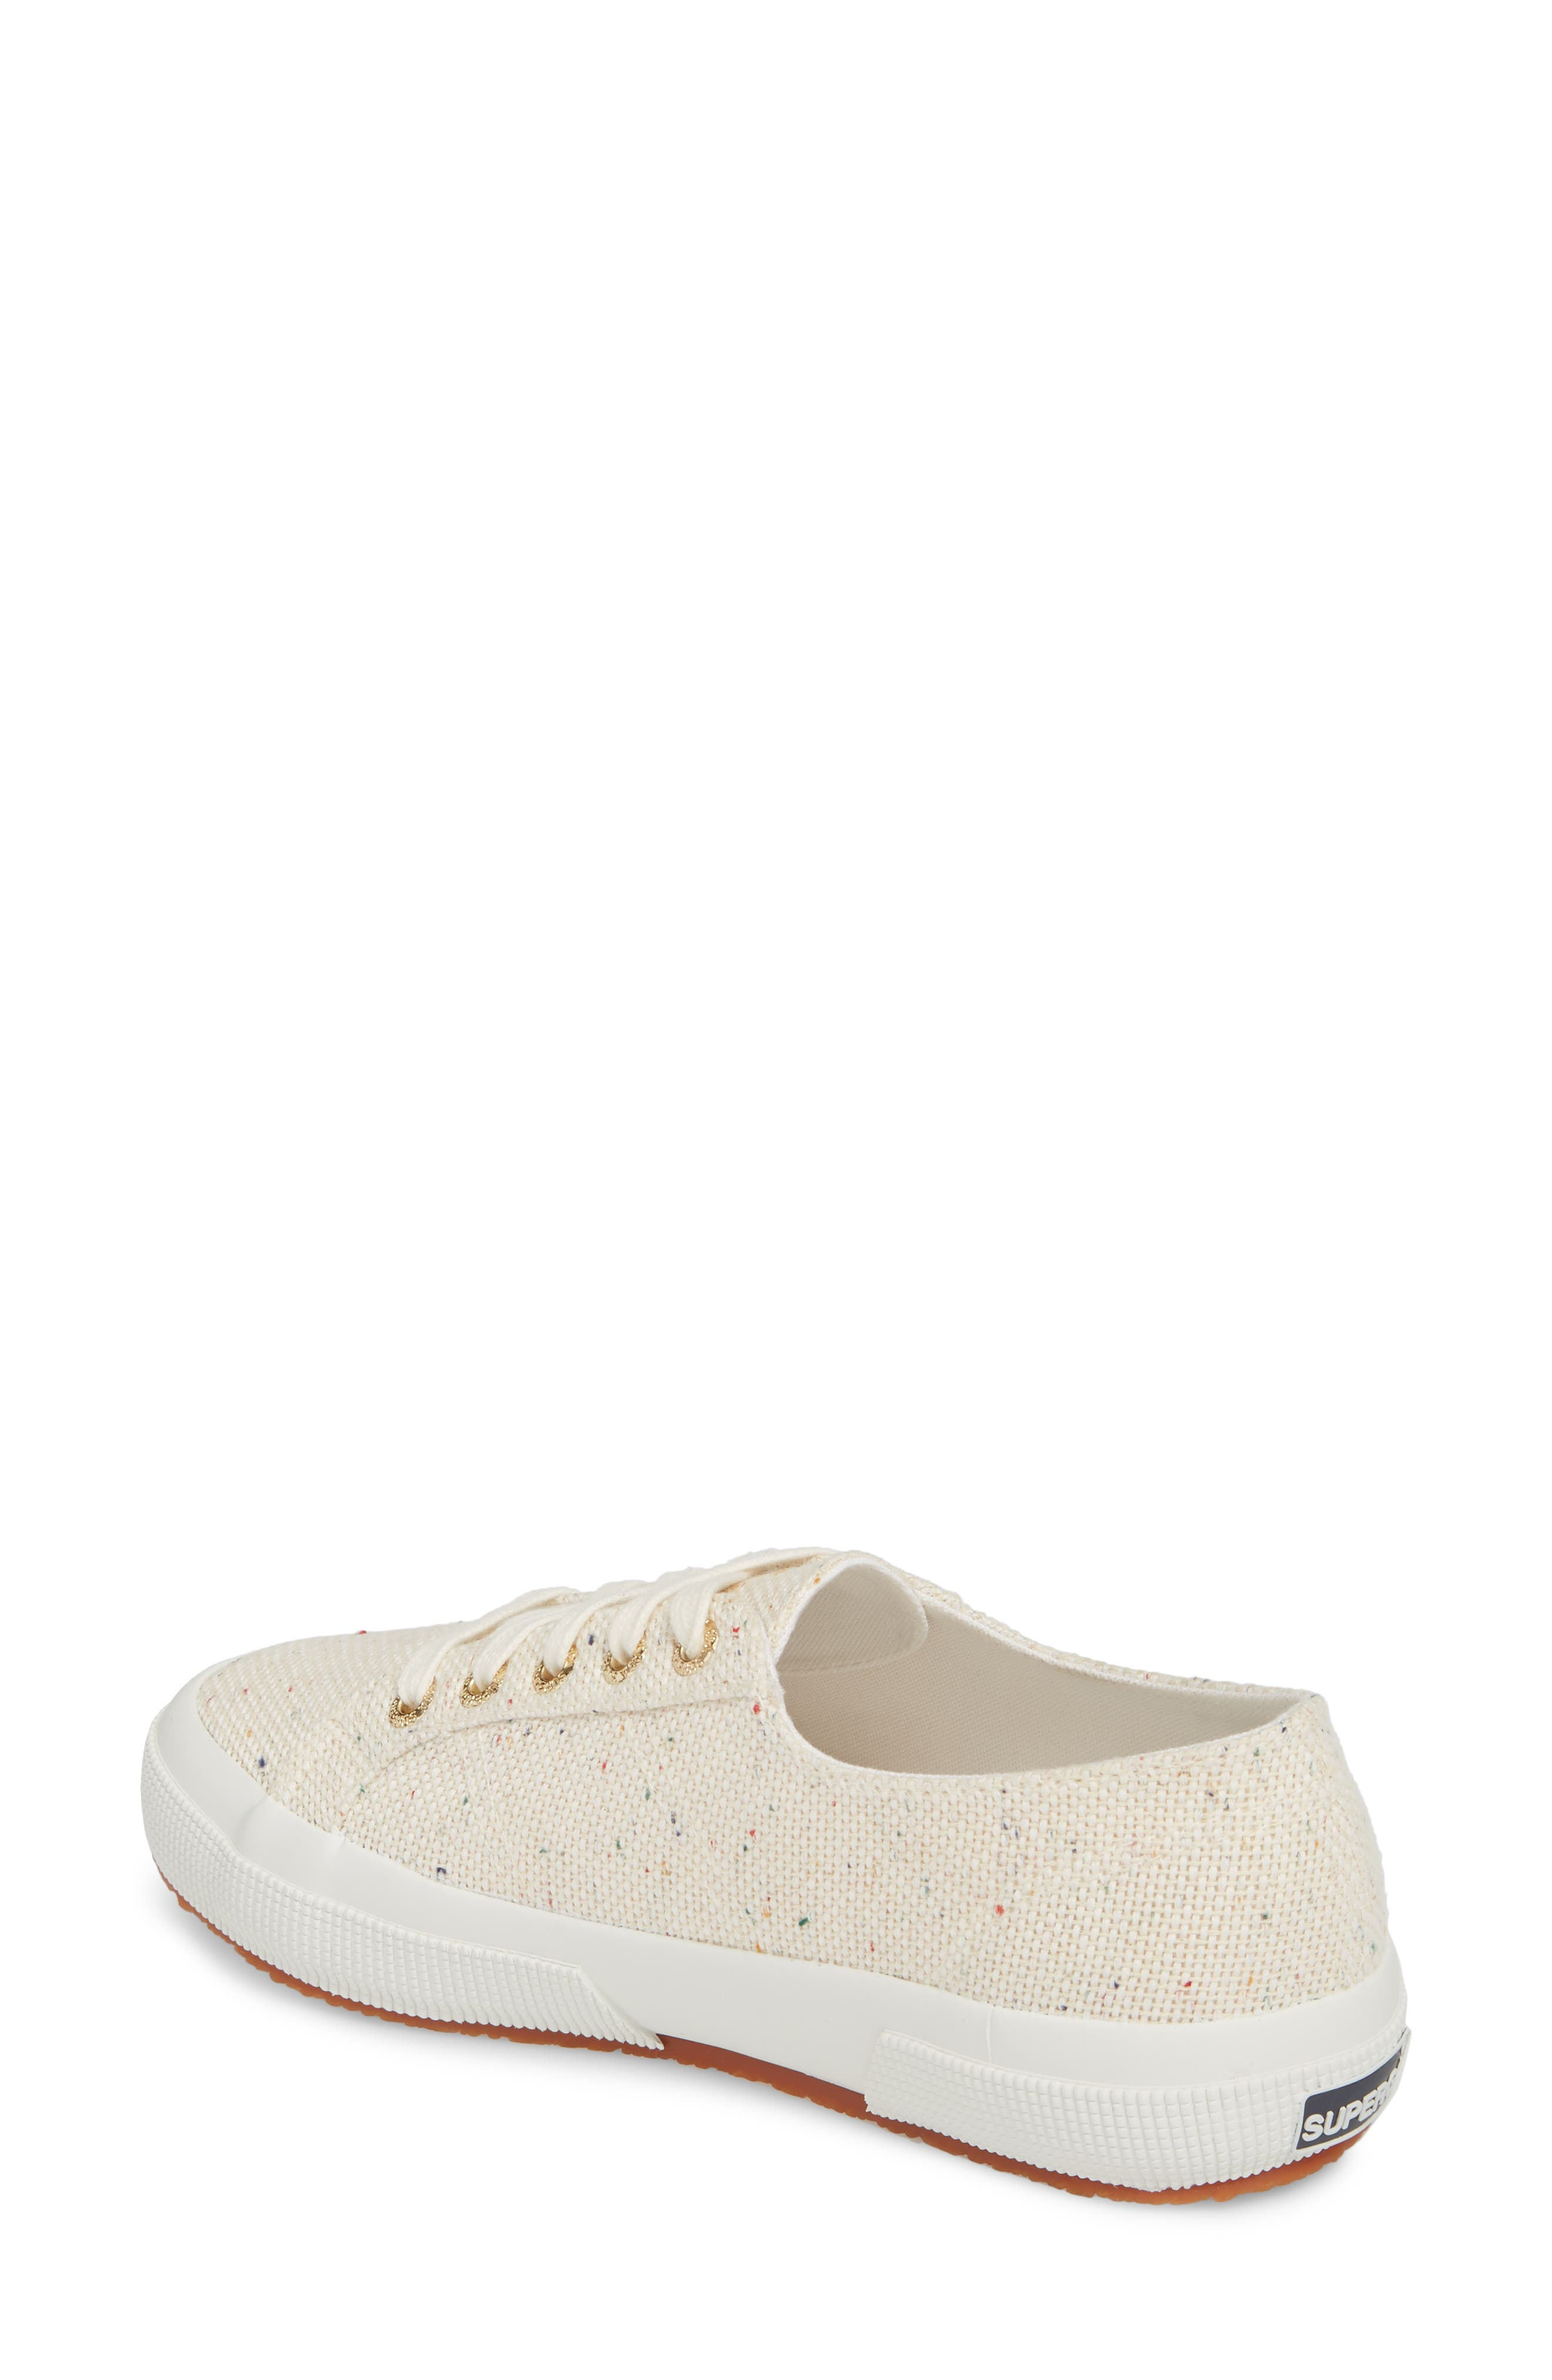 SUPERGA,                             2750 Speckle Low Top Sneaker,                             Alternate thumbnail 2, color,                             900